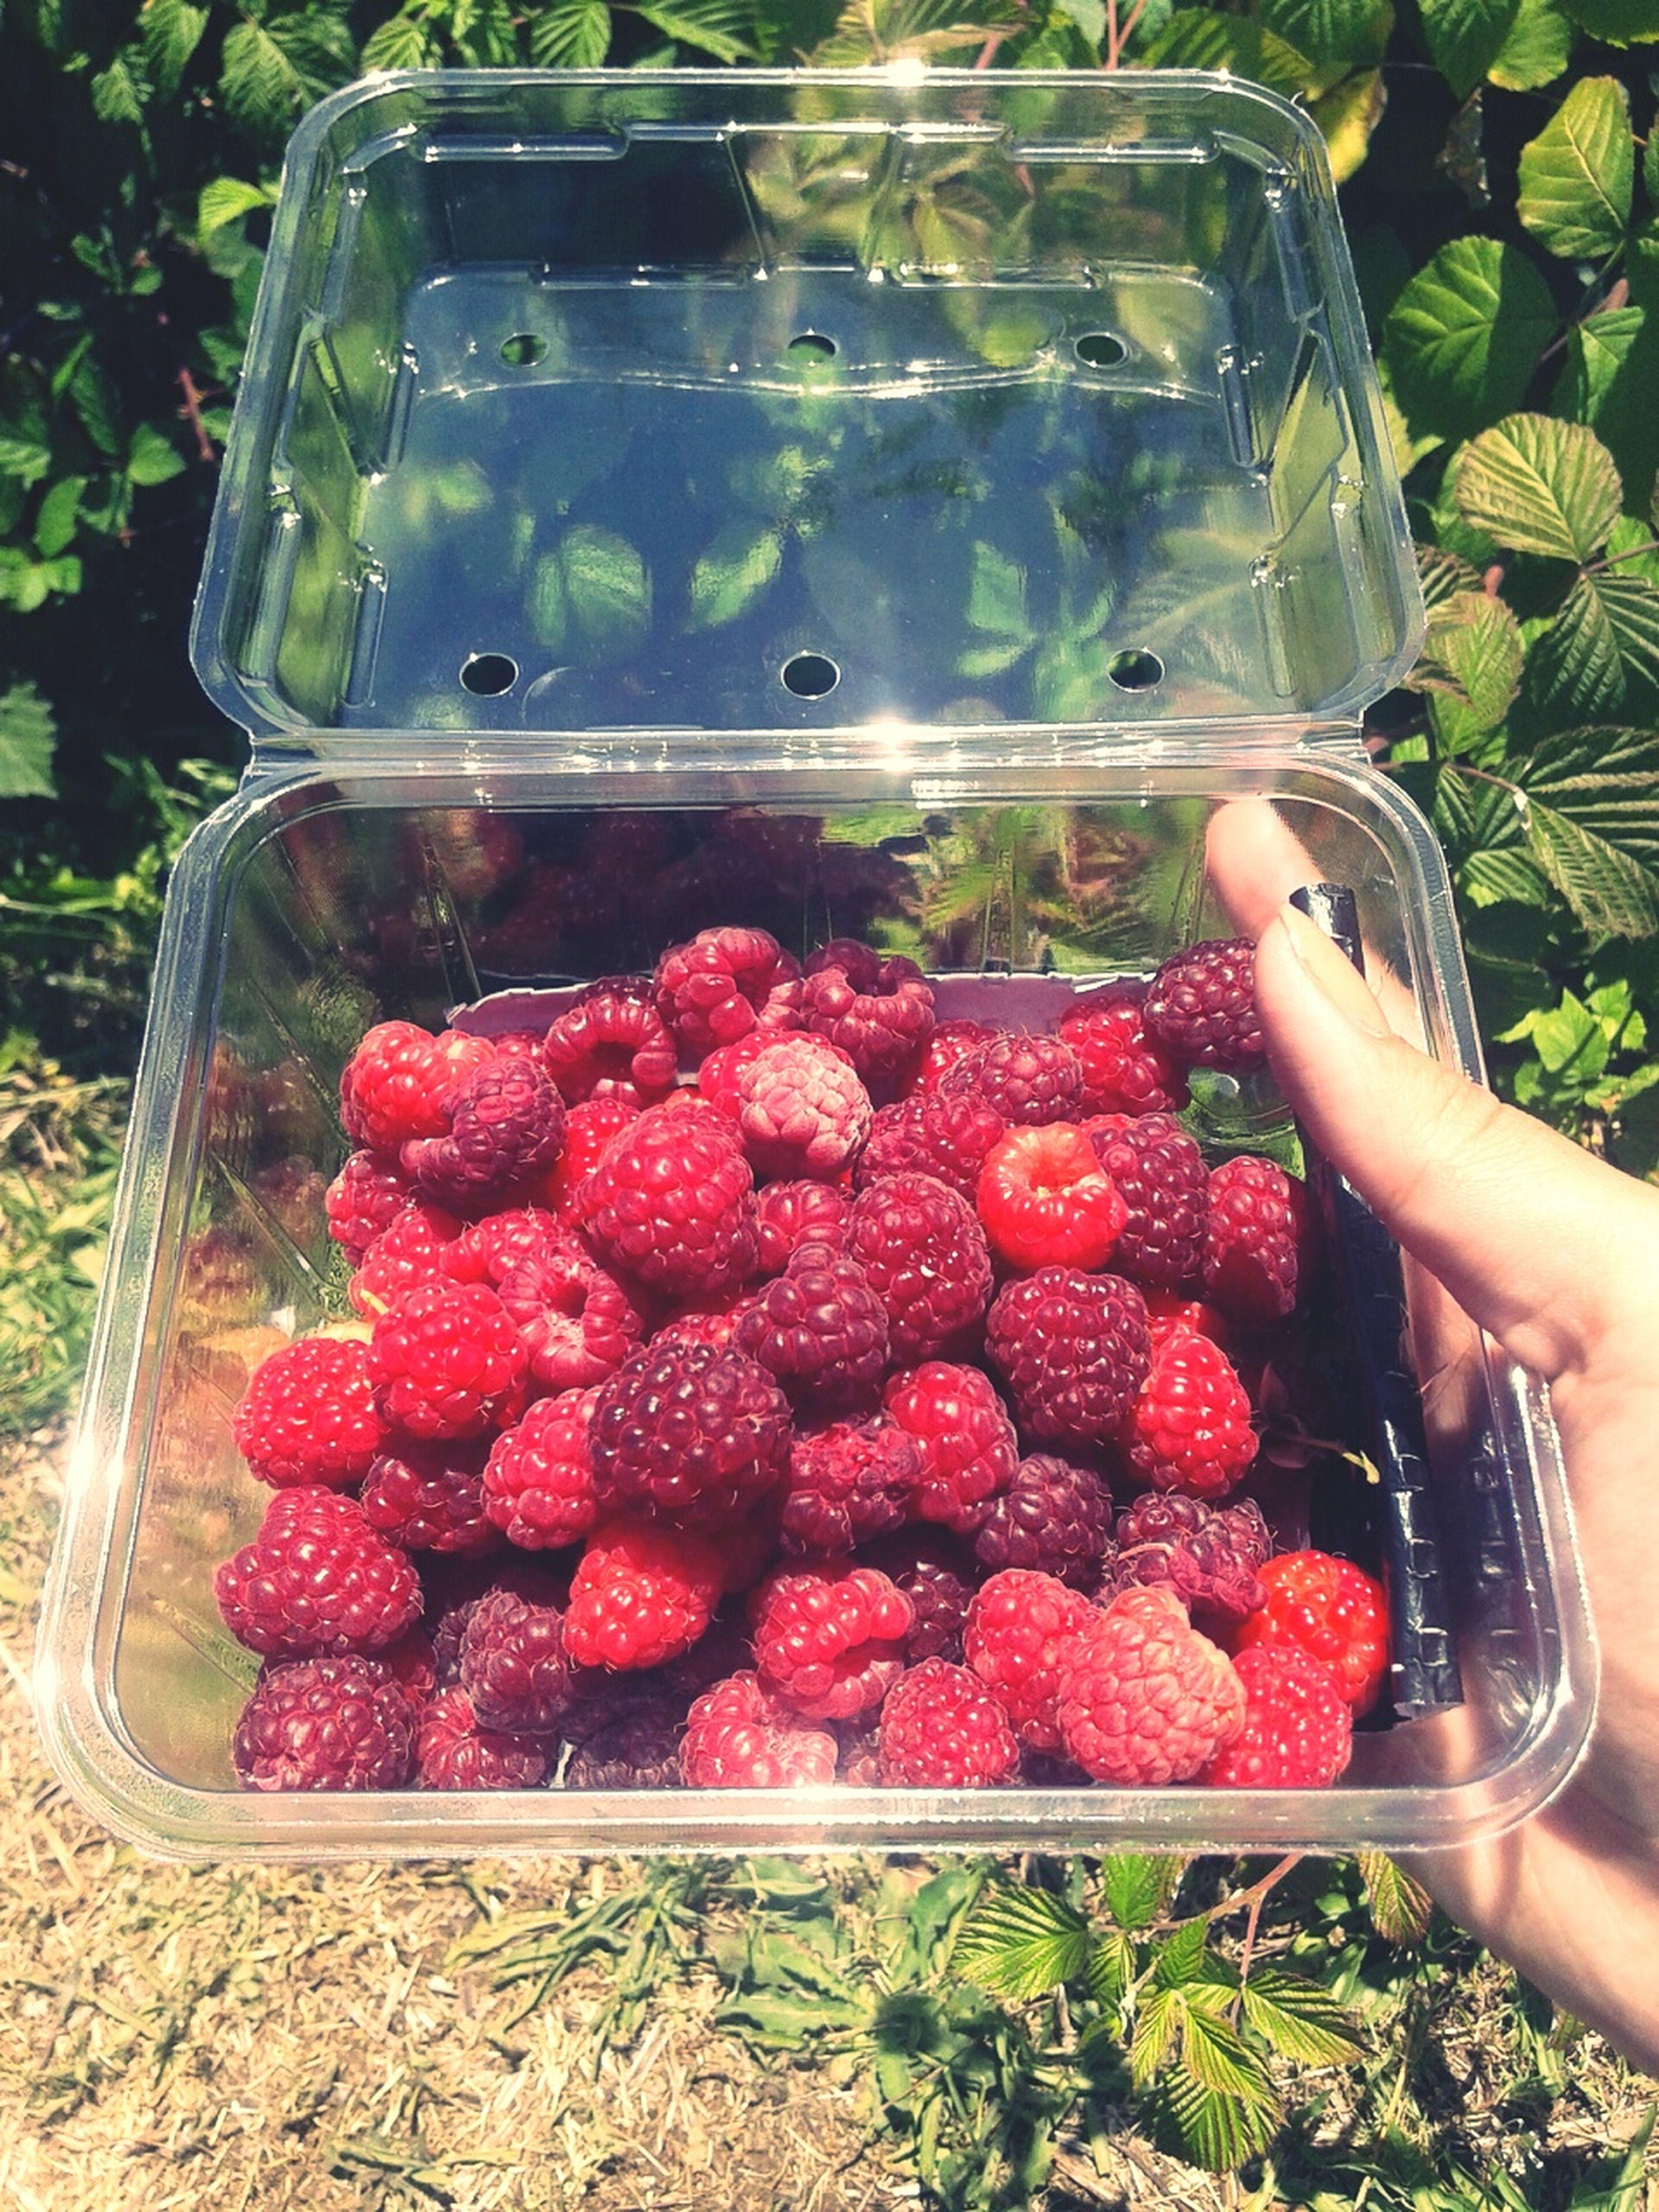 Nature Photography Freshlypicked Raspberries Fruits Perth Raspberry Farm